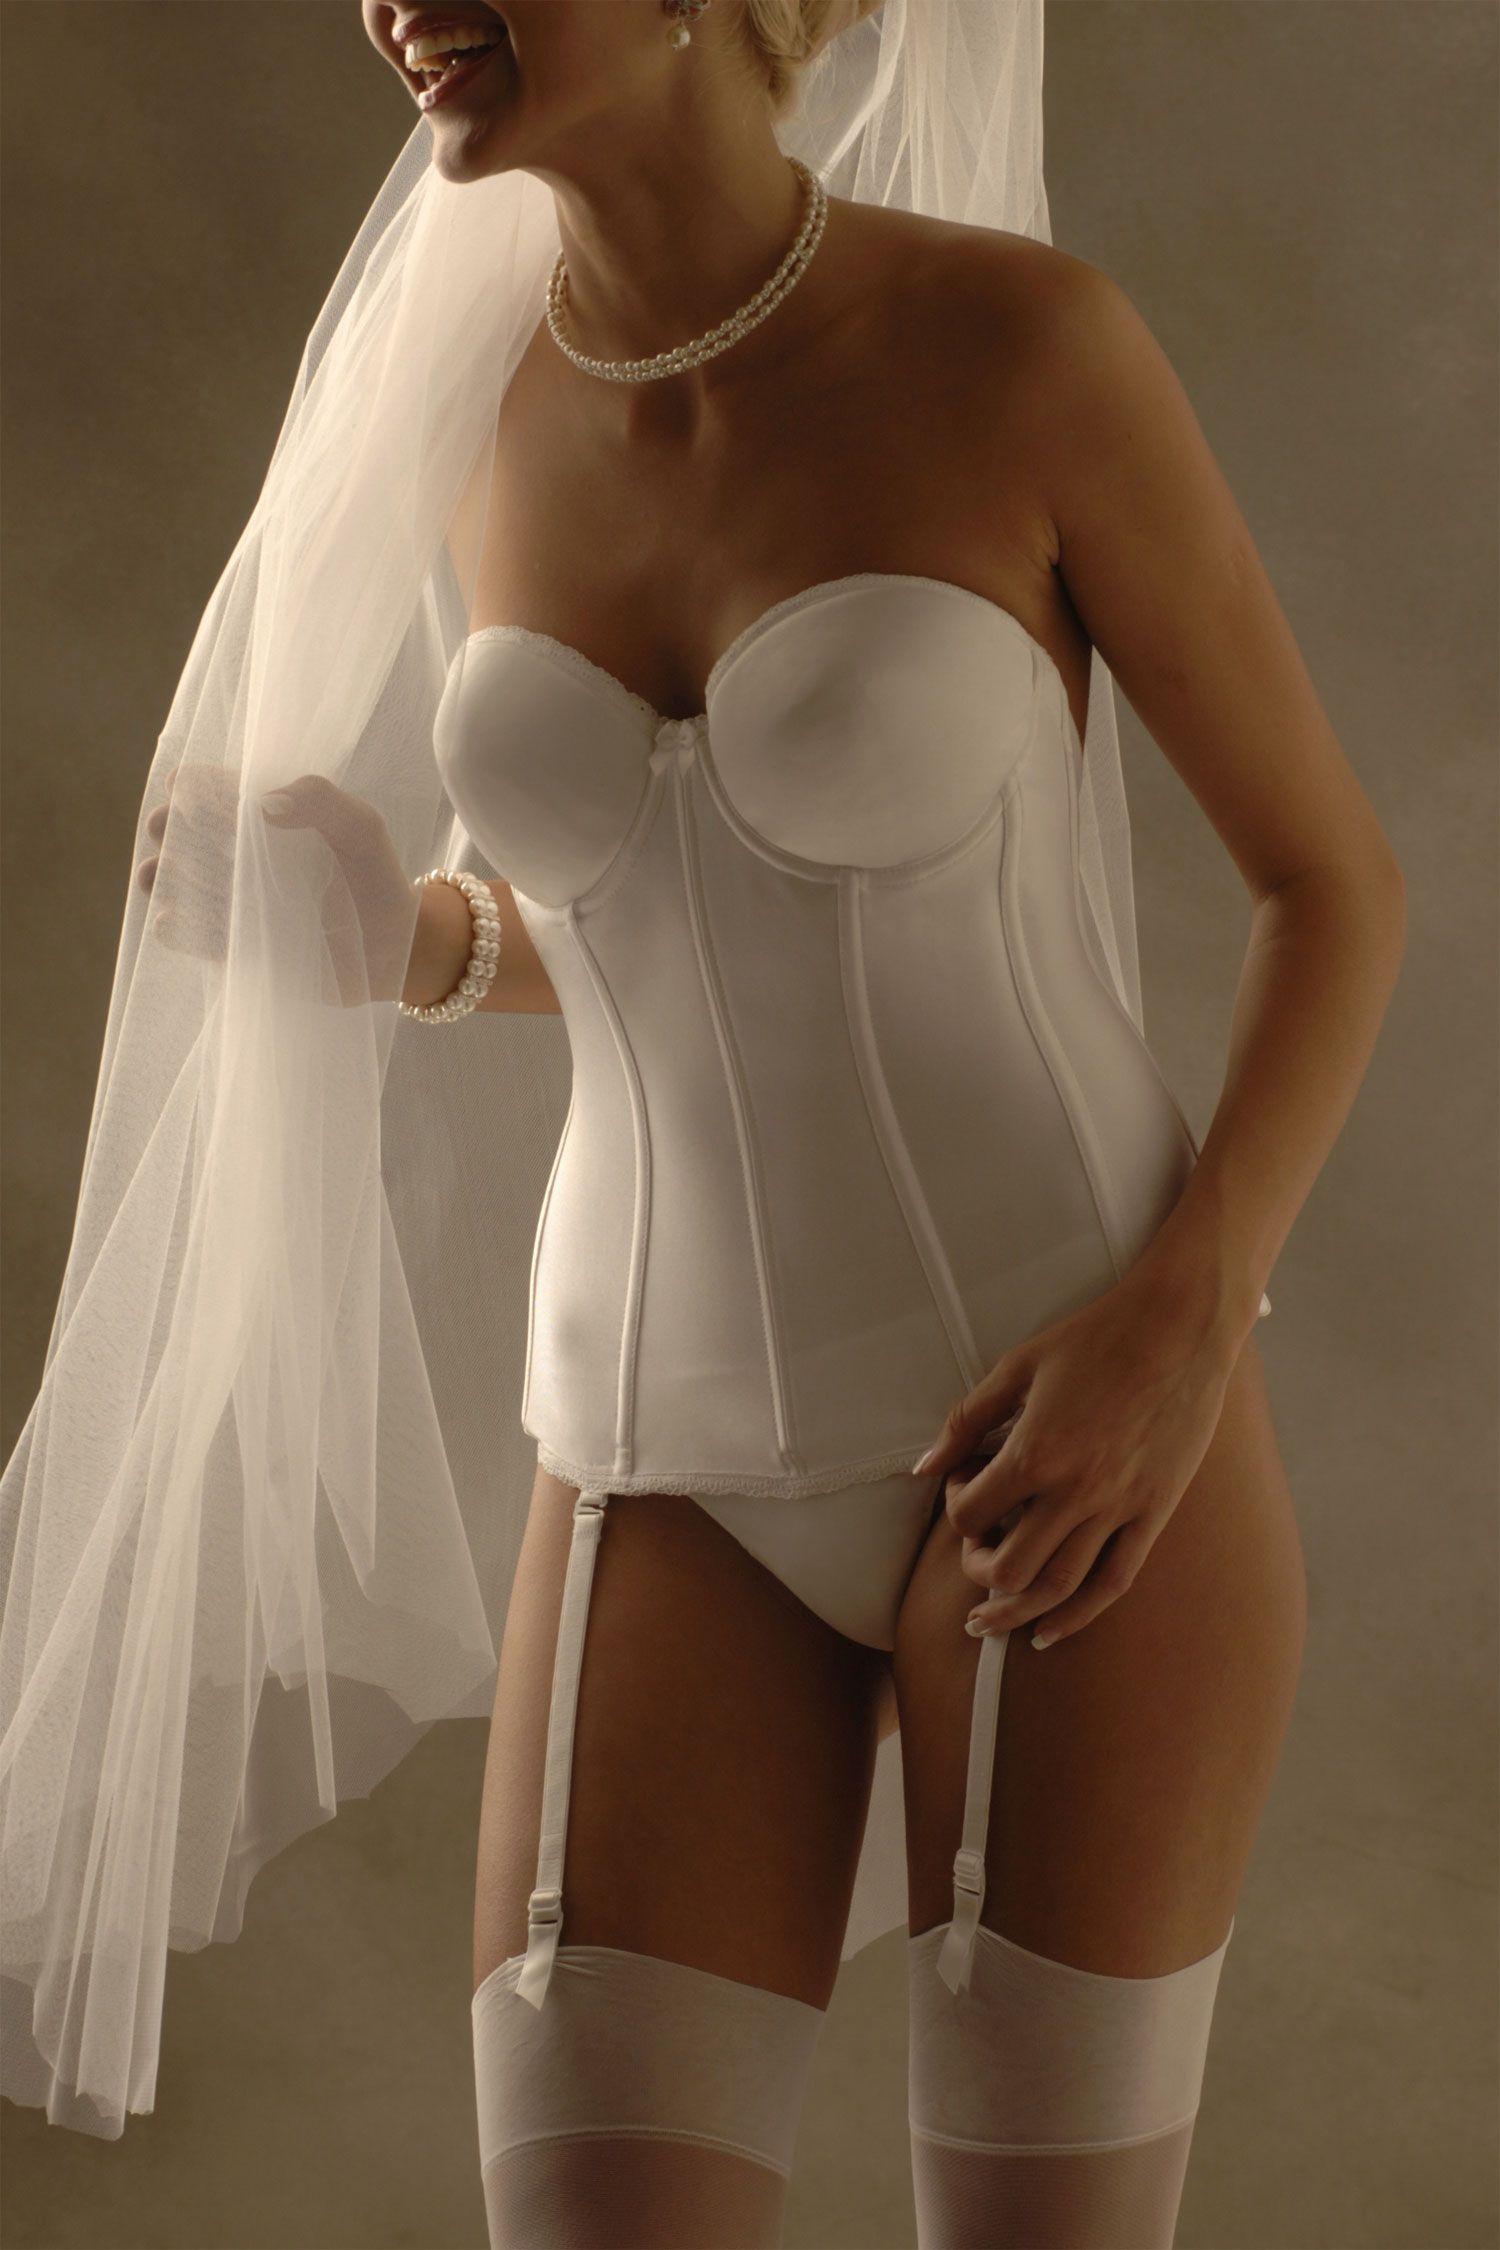 Brides Wedding Underwear Dress Undergarments Bridal Support Shapewear And Honeymoon Lingerie Va